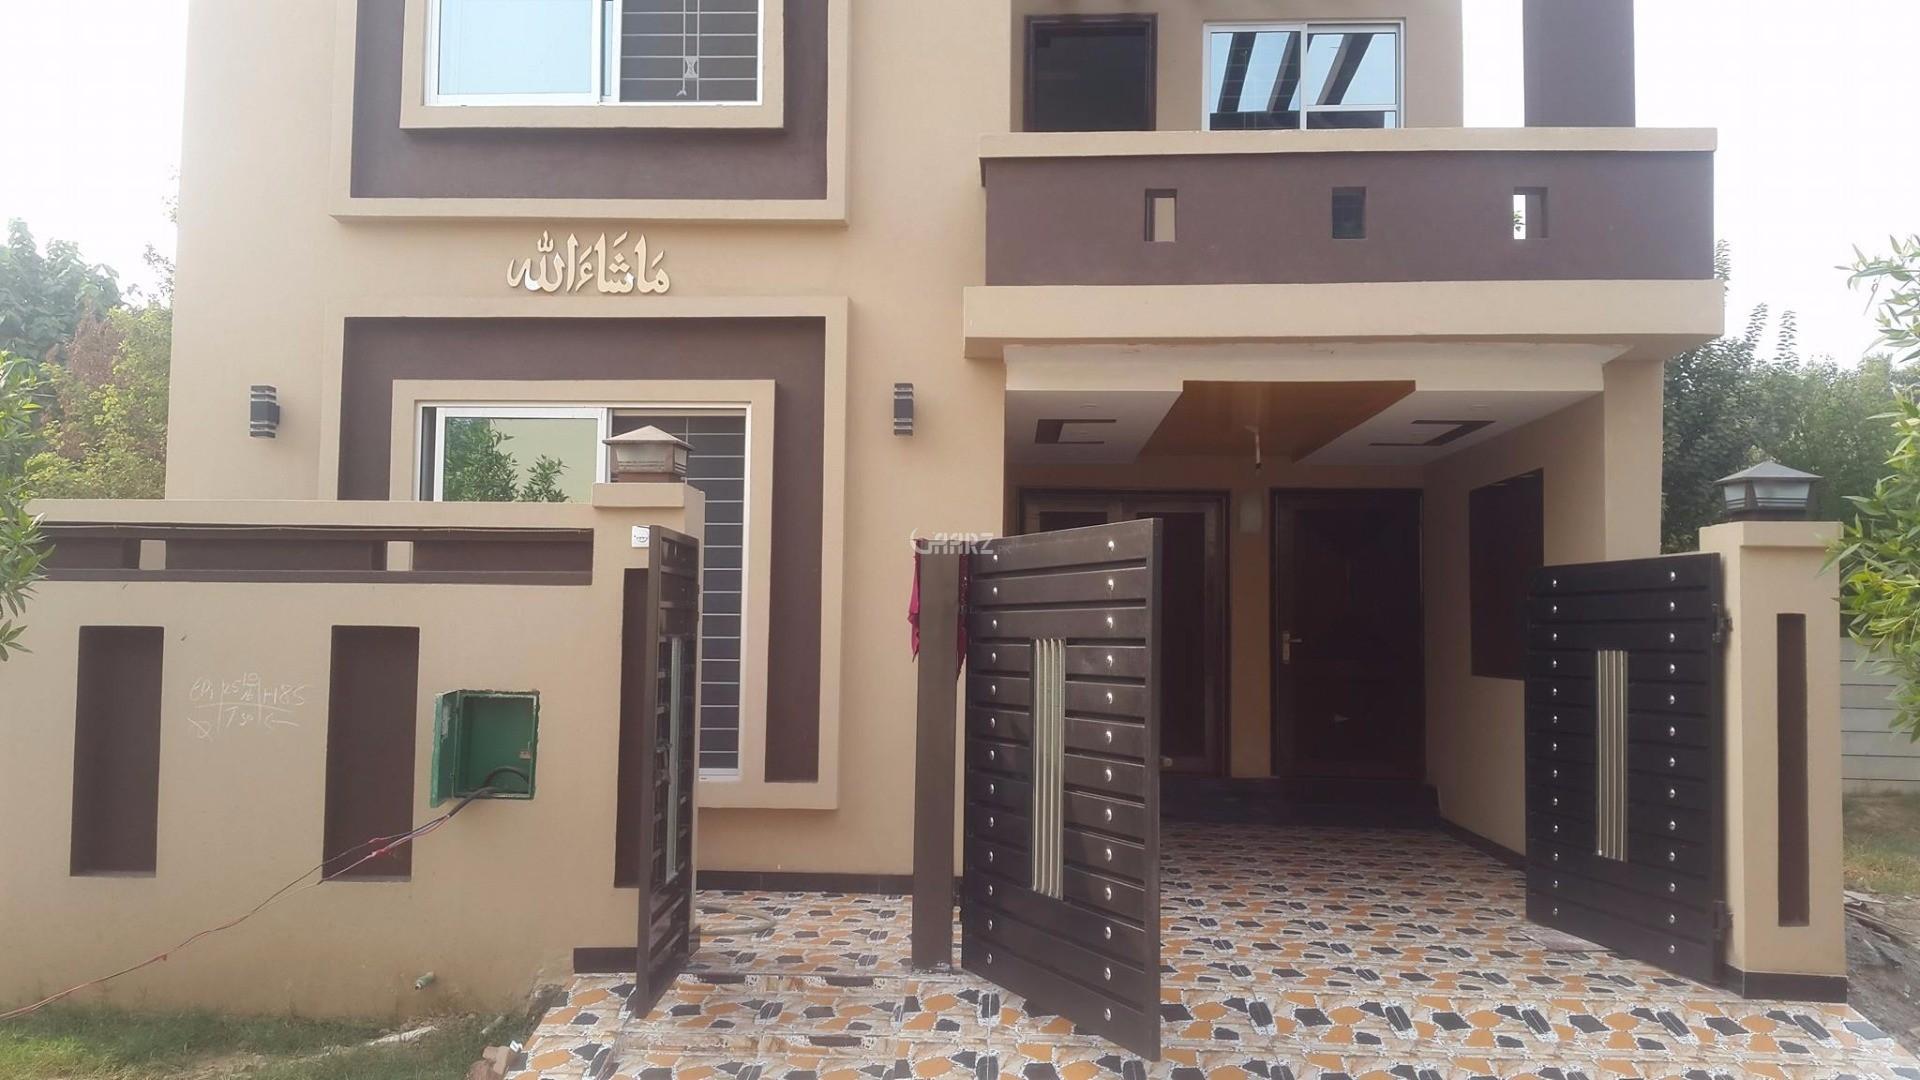 10 Marla bungalow for Sale in Gulistan-e-jauhar Karachi